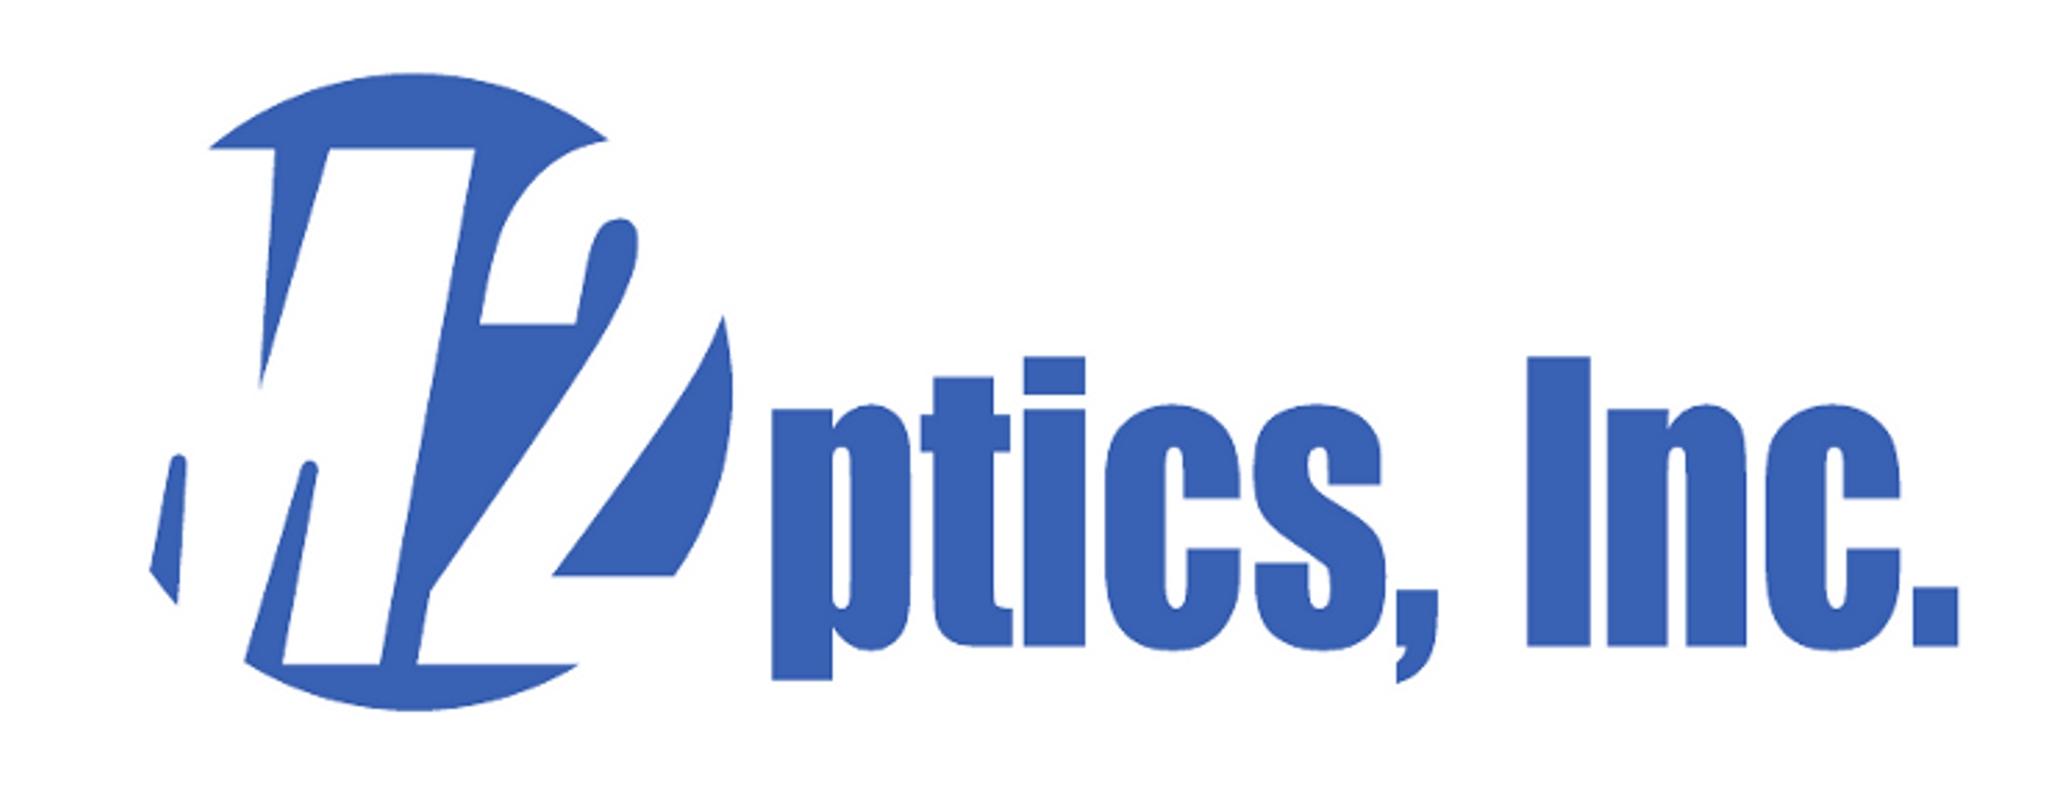 M2 Optics Hi Res.jpg